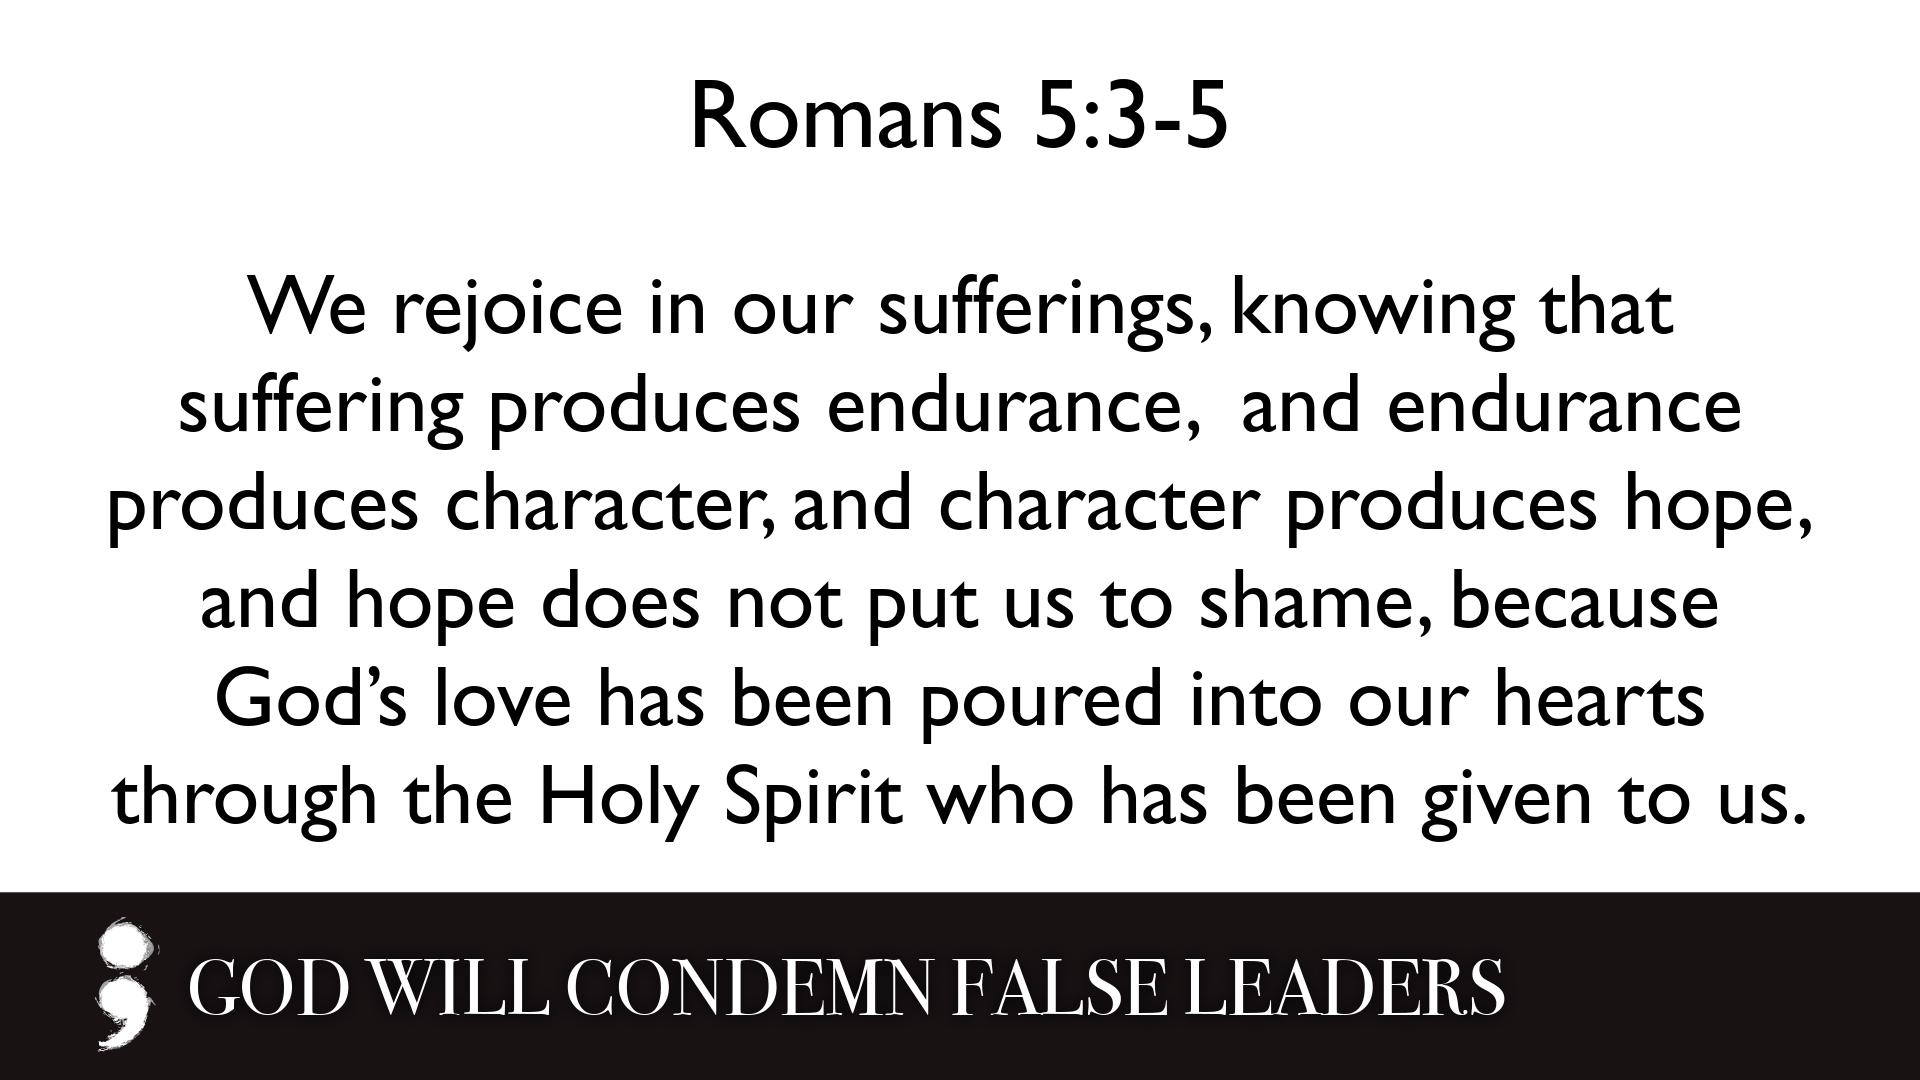 God will condemn false leaders.005.png